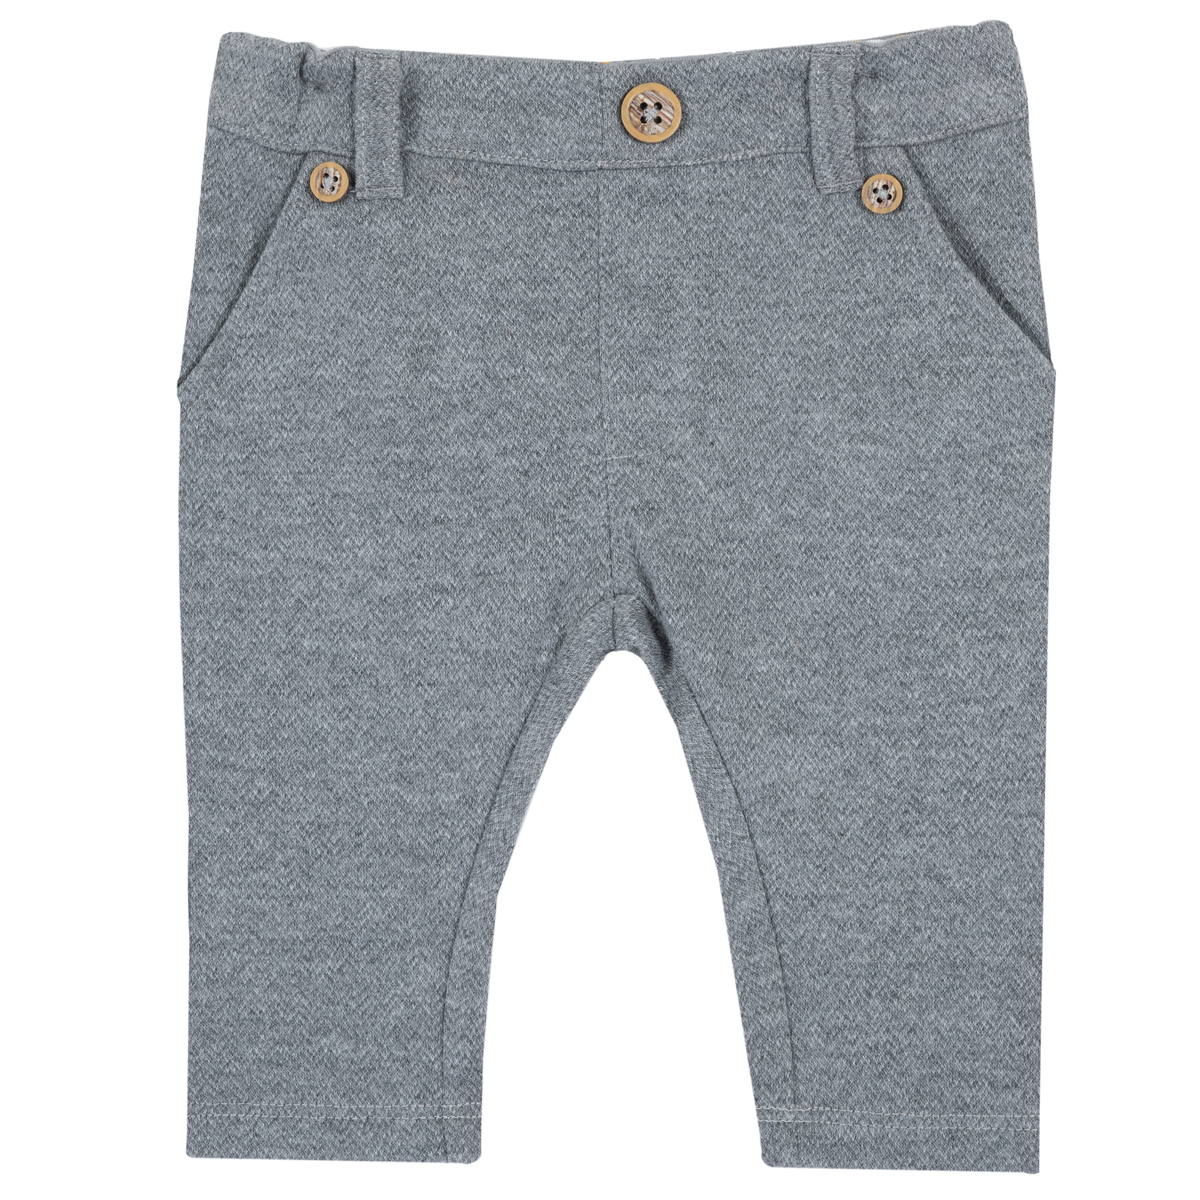 Pantaloni lungi copii Chicco, gri, 94684